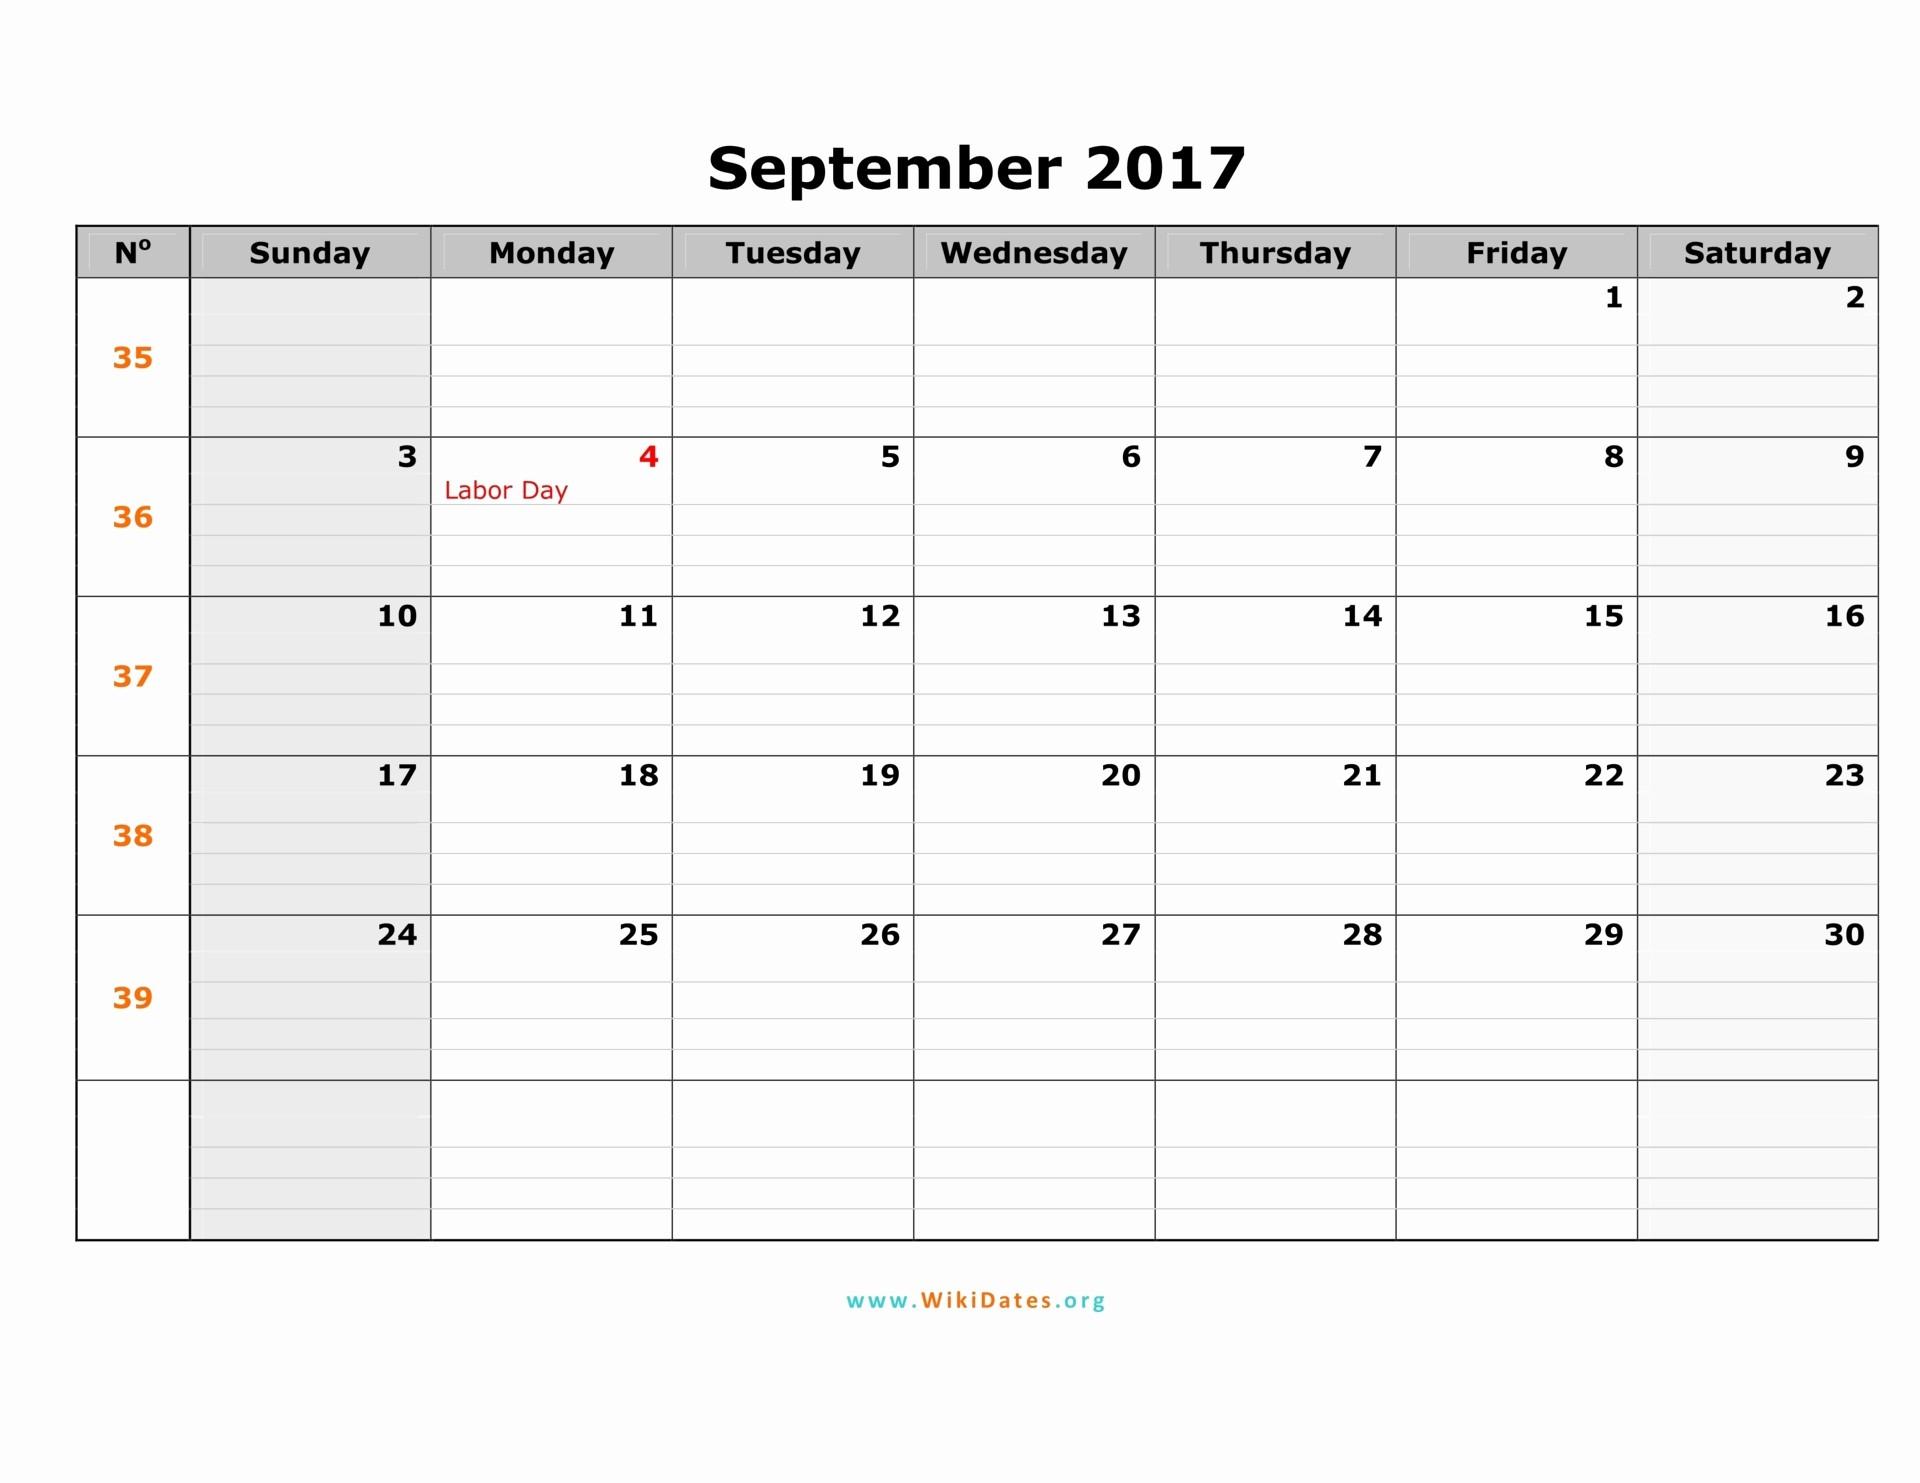 September 2017 Printable Calendar Word Awesome September 2017 Calendar